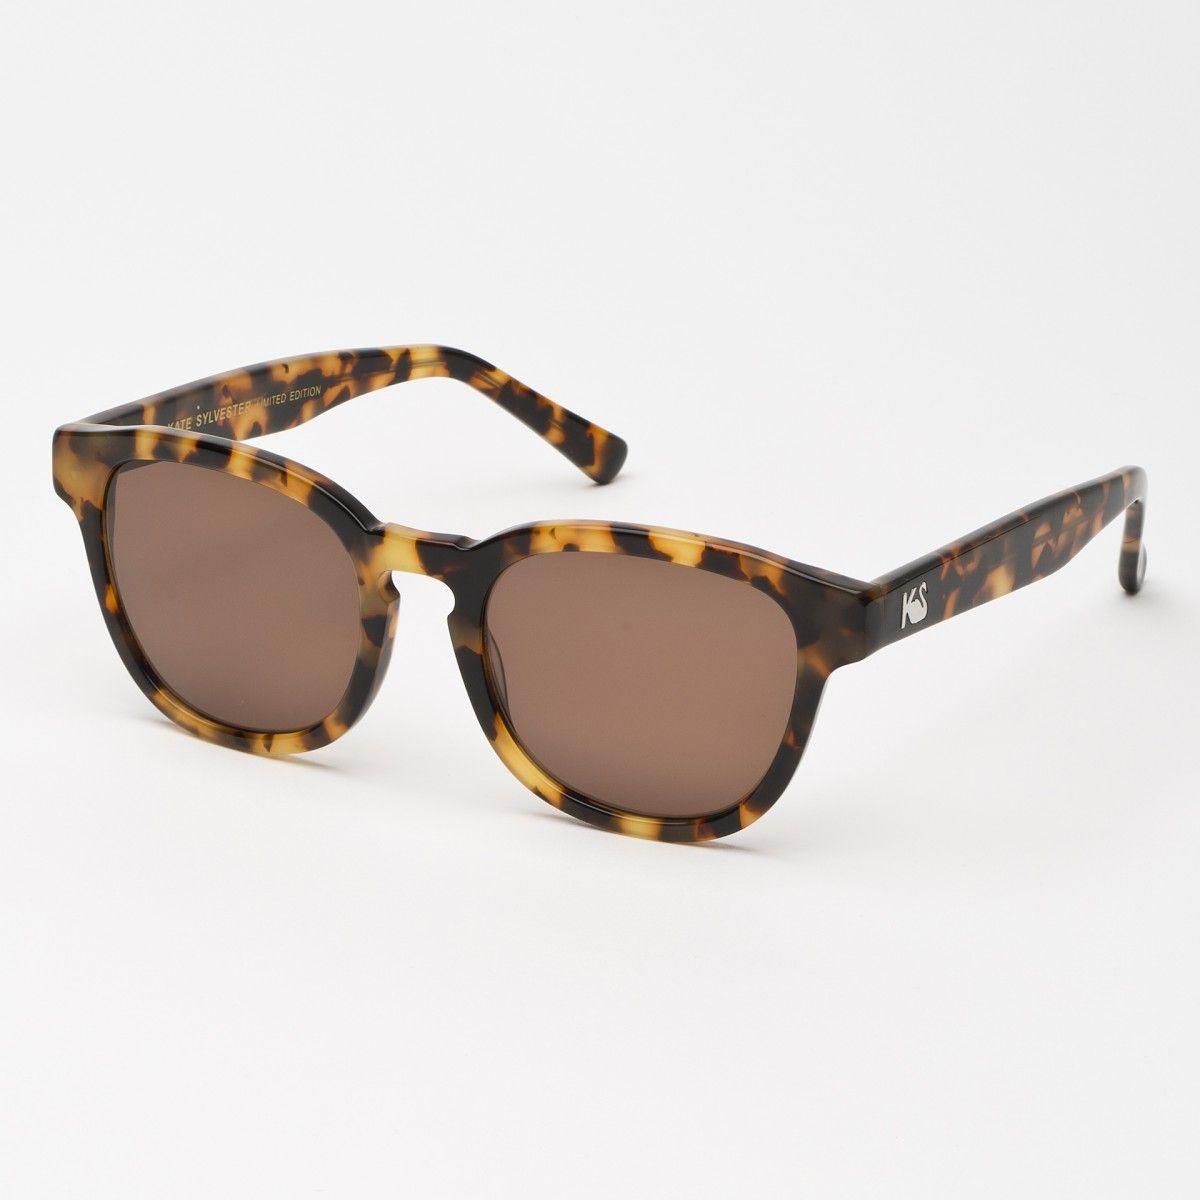 Eyewear - Kate Sylvester Sunglasses: Holly - Honey Tort